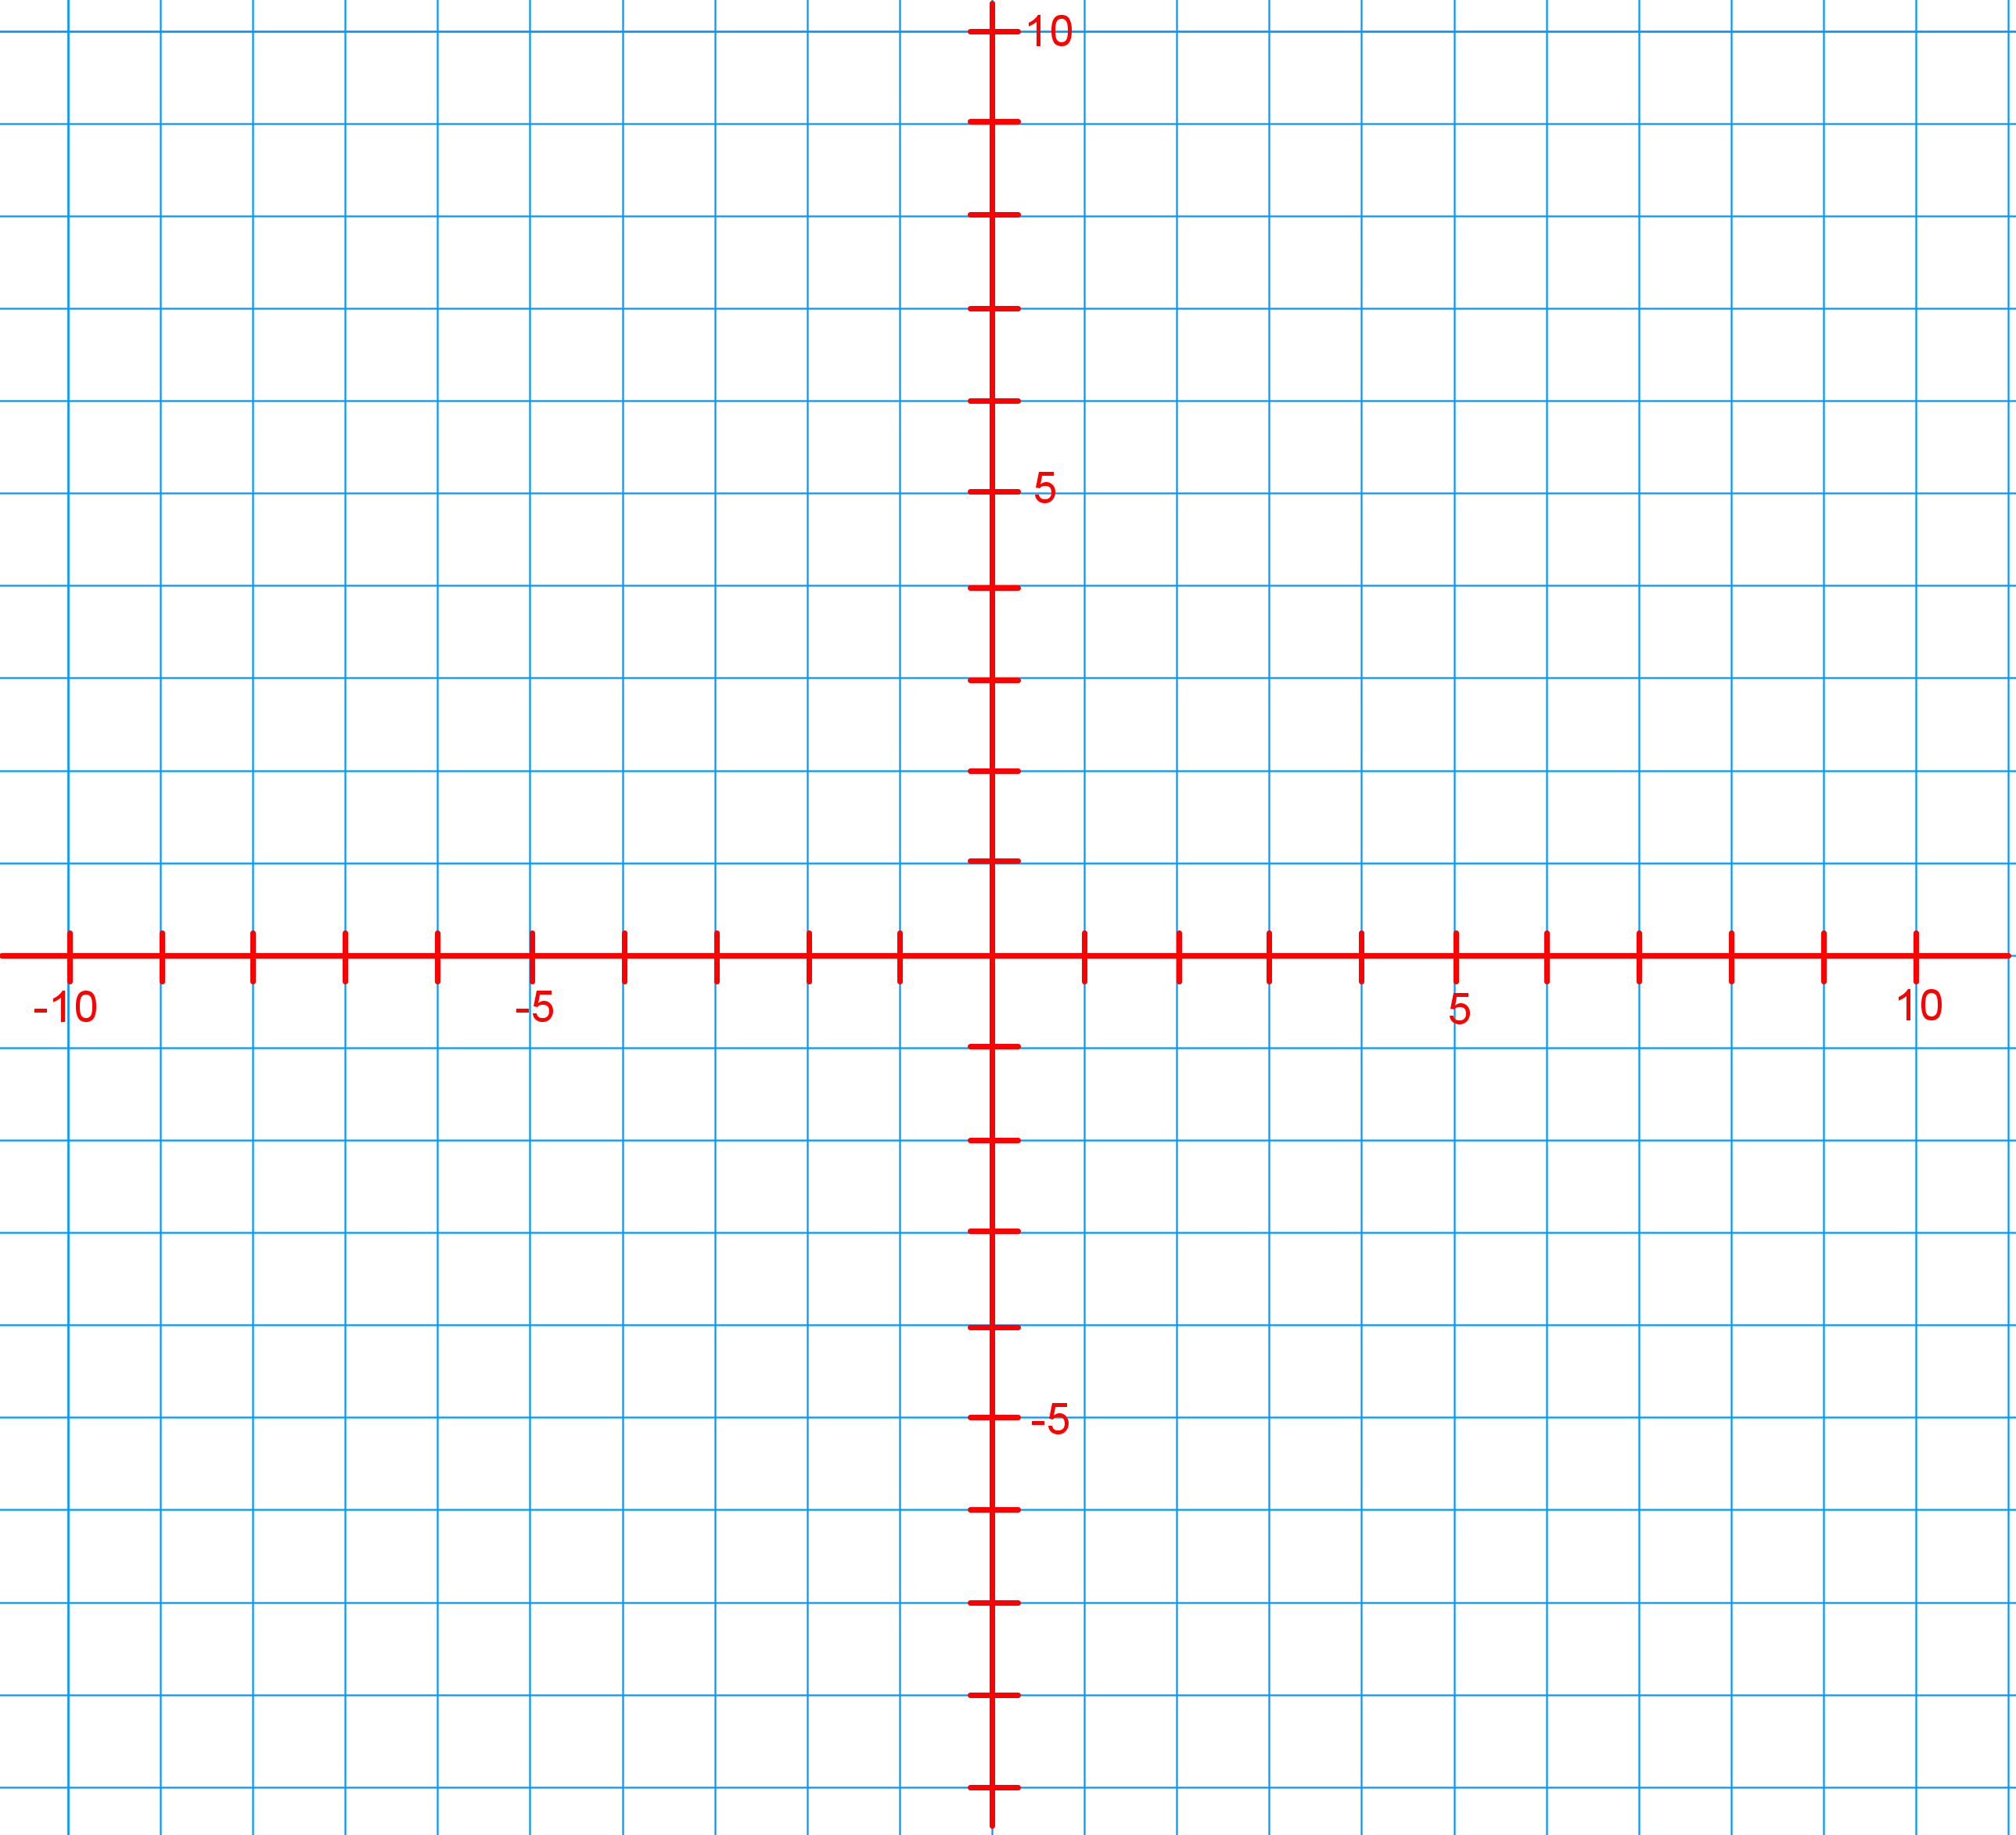 plot points on Cartesian plane